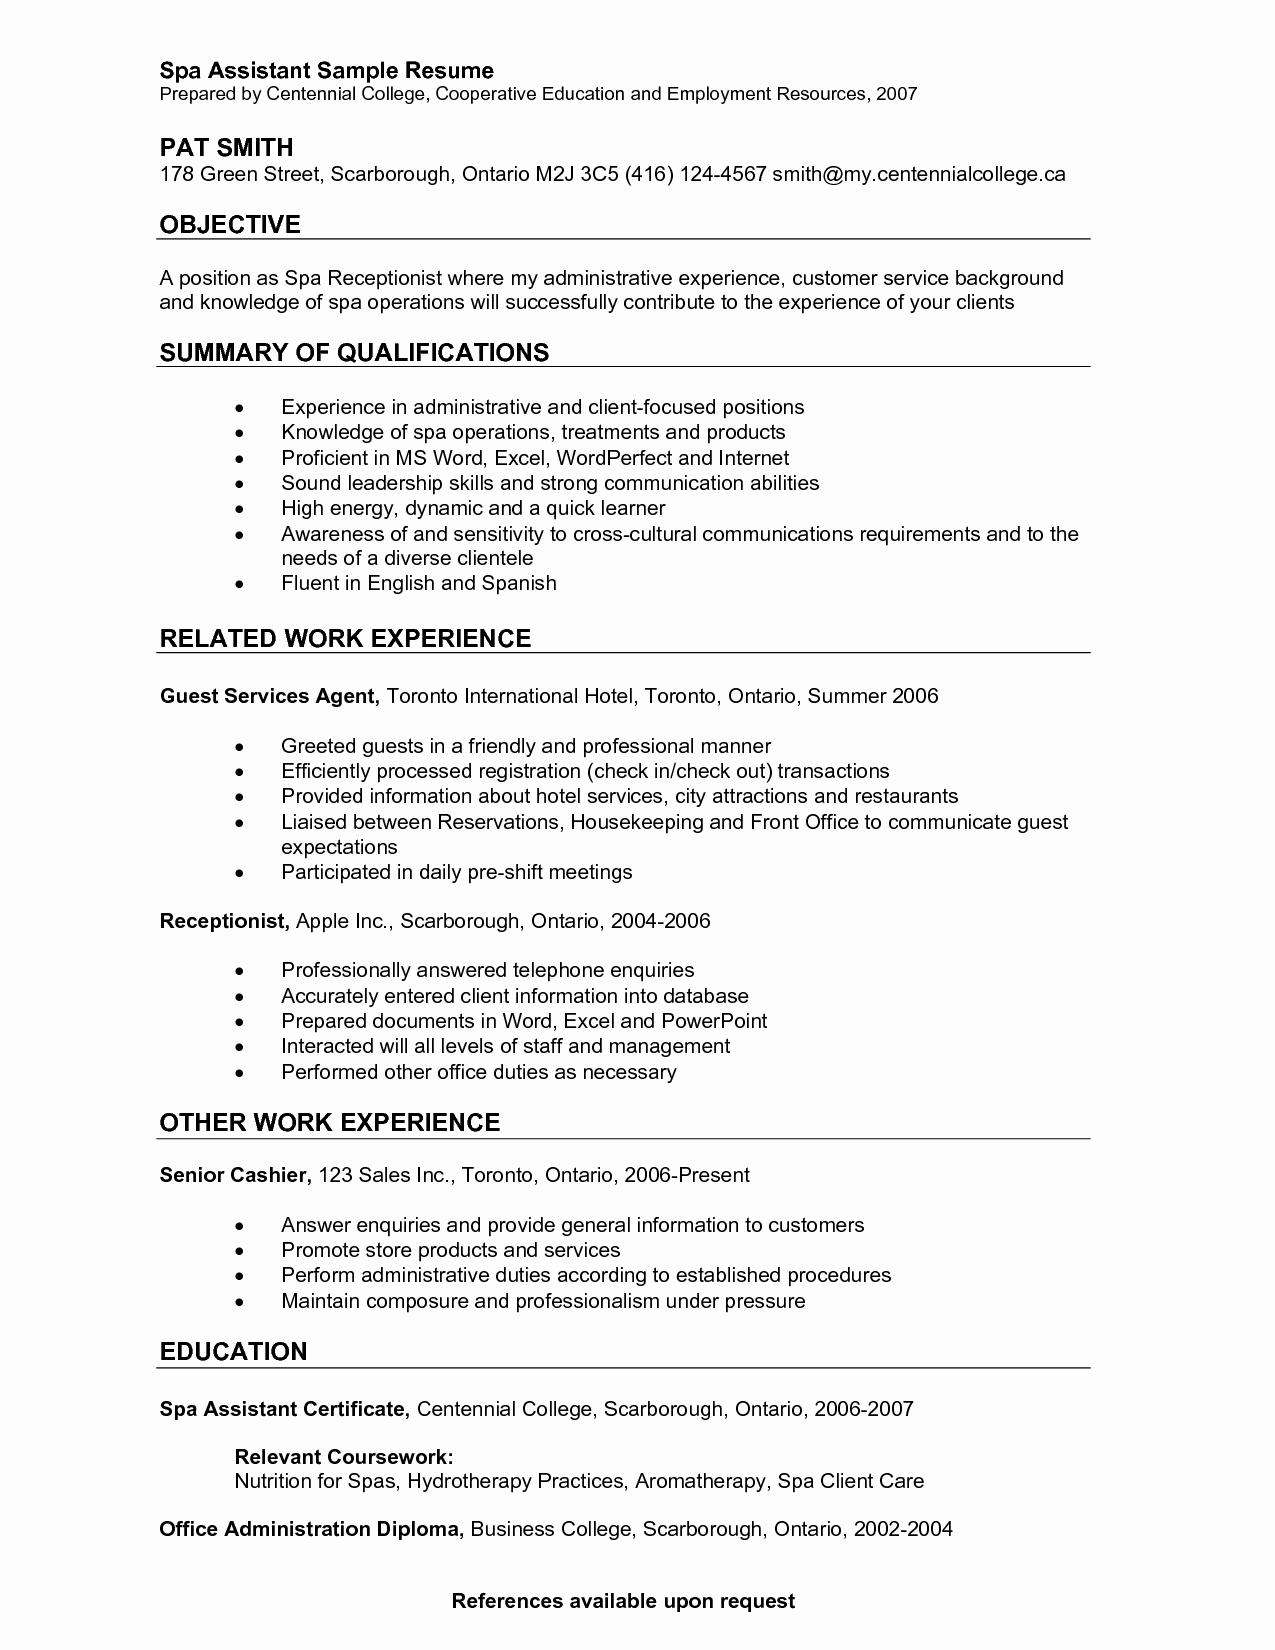 Medical Receptionist Resume Objective Samples